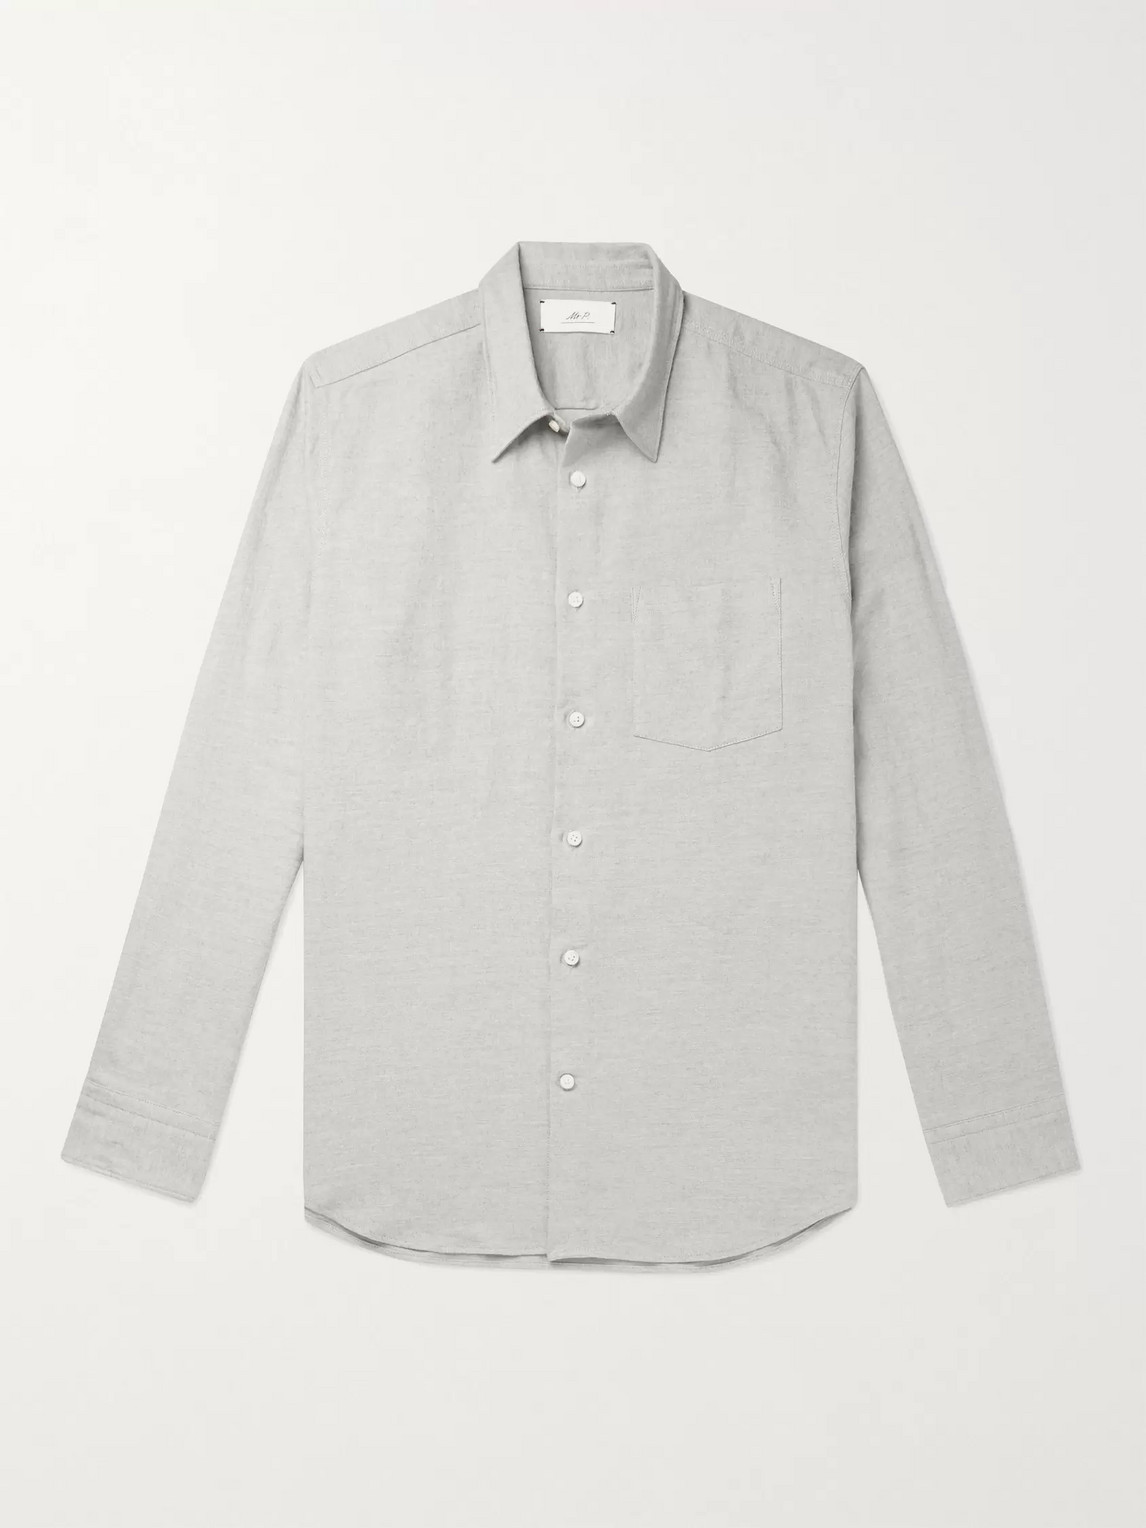 mr p. - paul mã©lange cotton, linen and wool-blend flannel shirt - men - gray